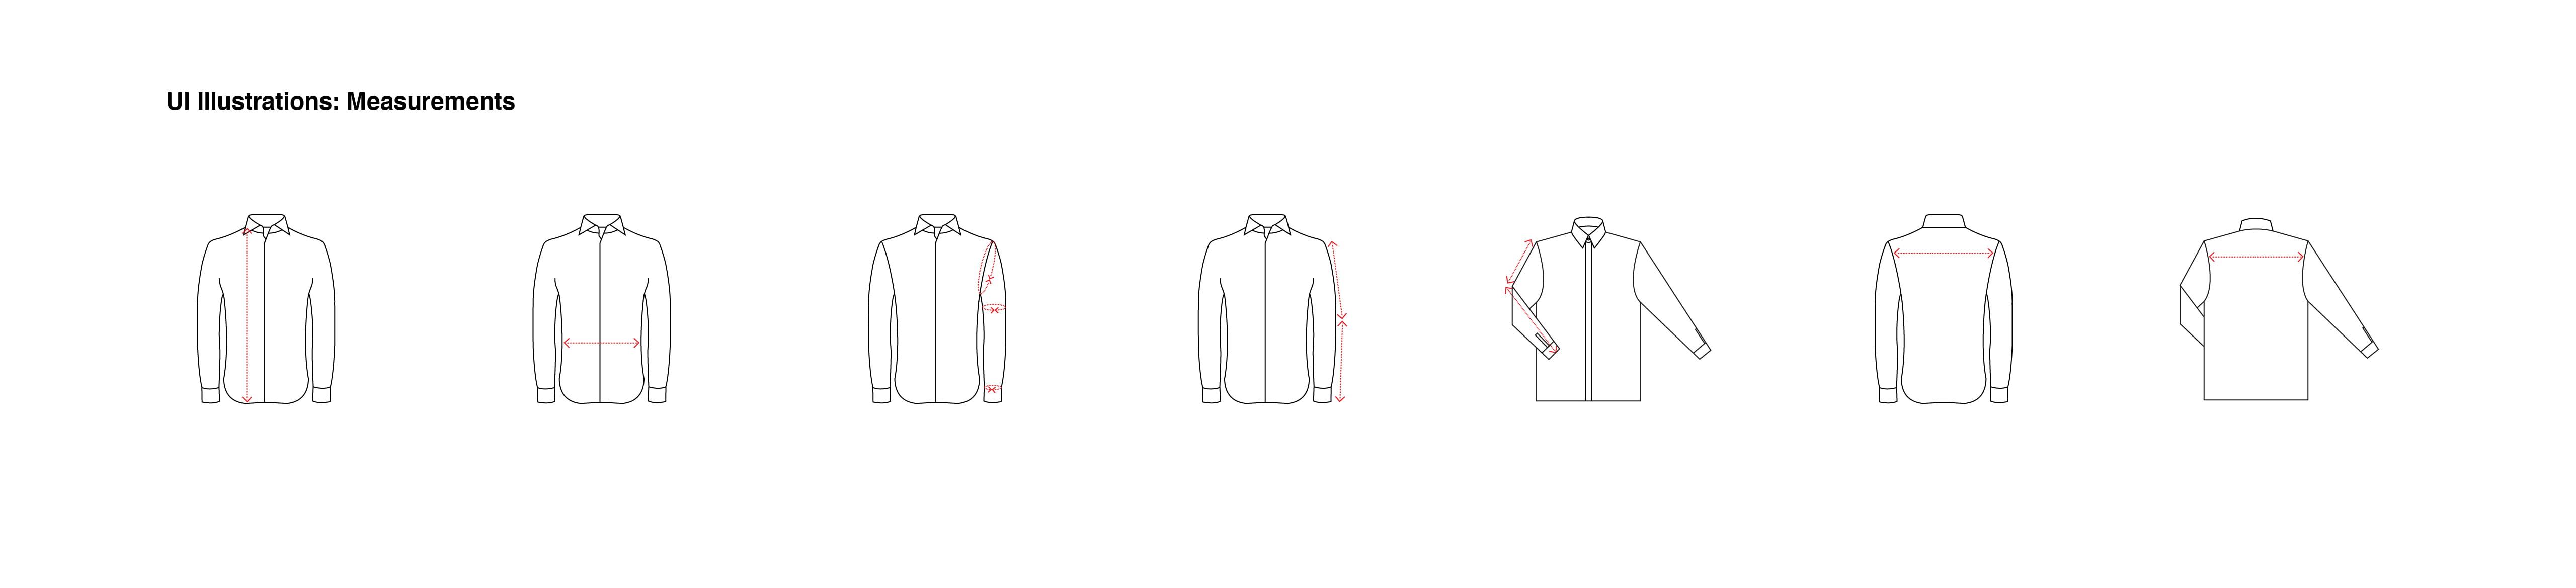 UI Illustrations 02 Measurements@2x-100